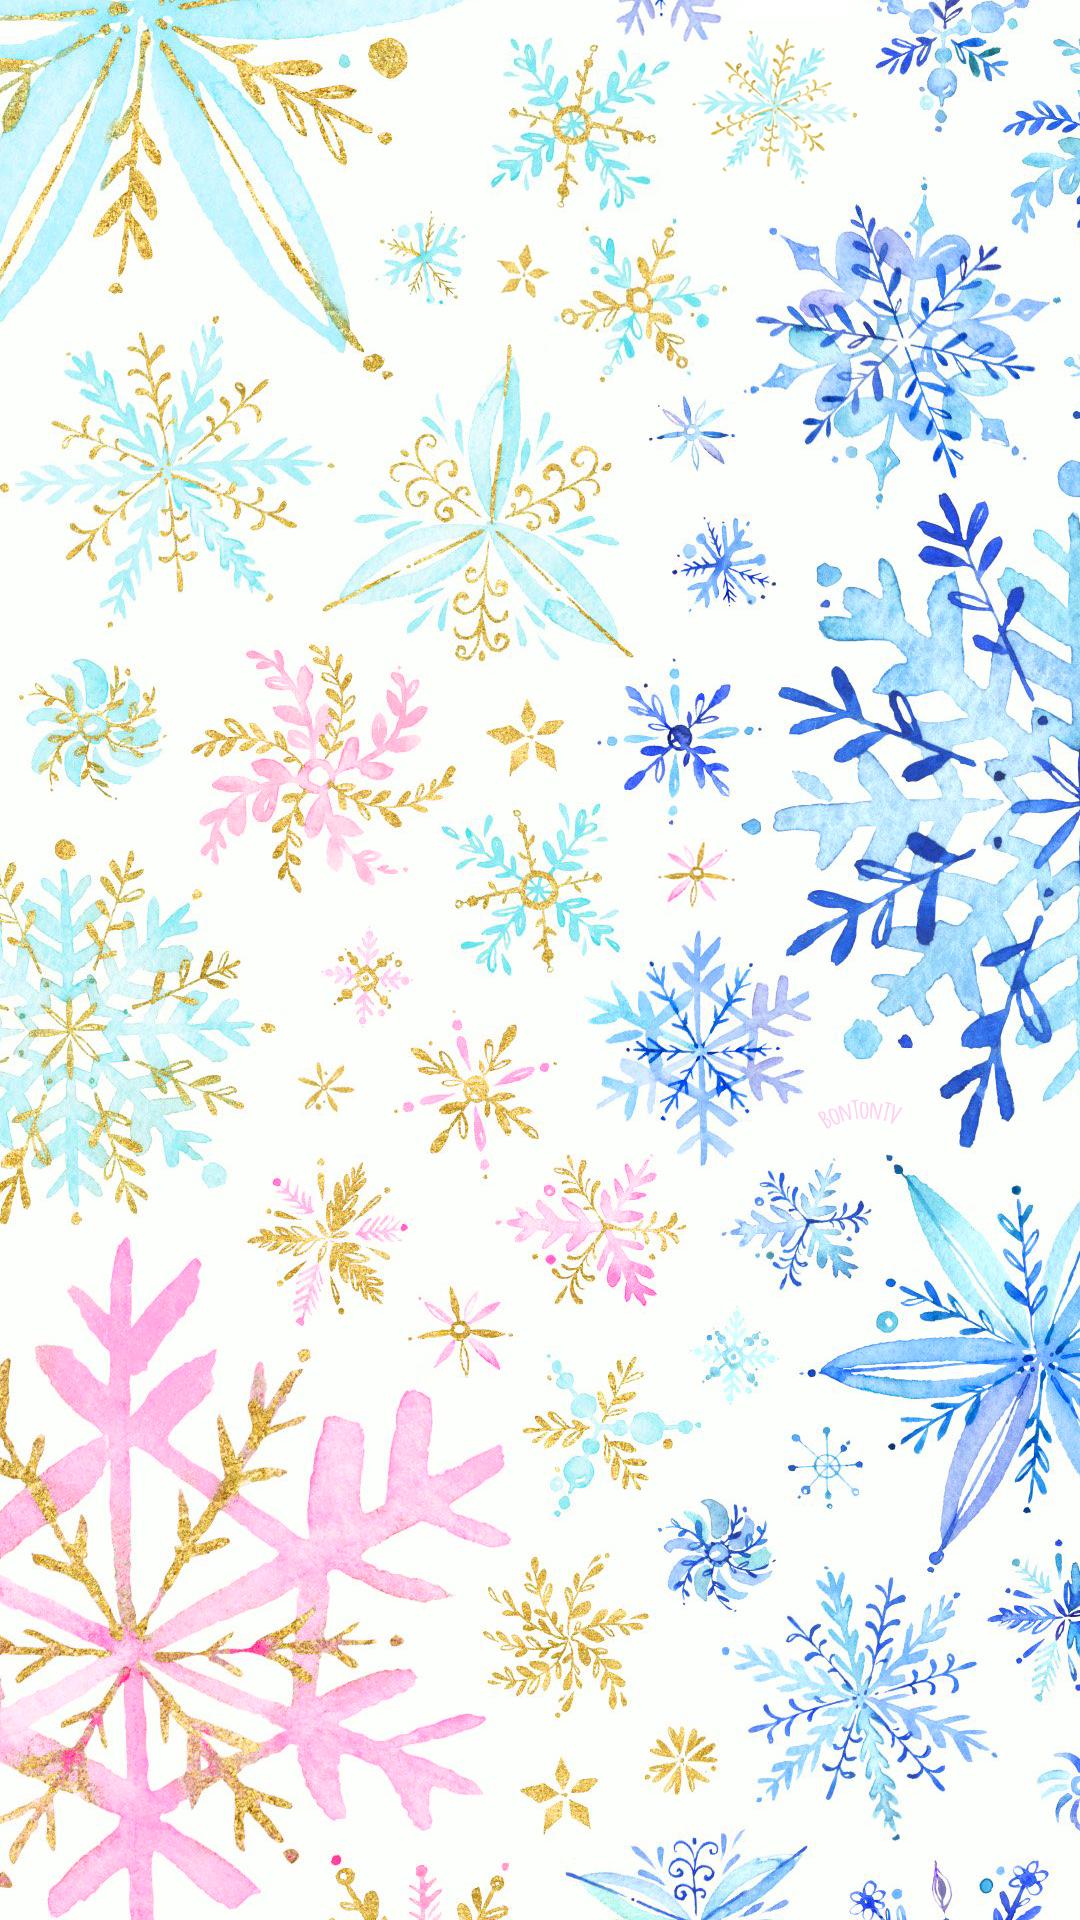 Phone Wallpapers Hd Watercolor Gold Snowflakes By Bonton Tv